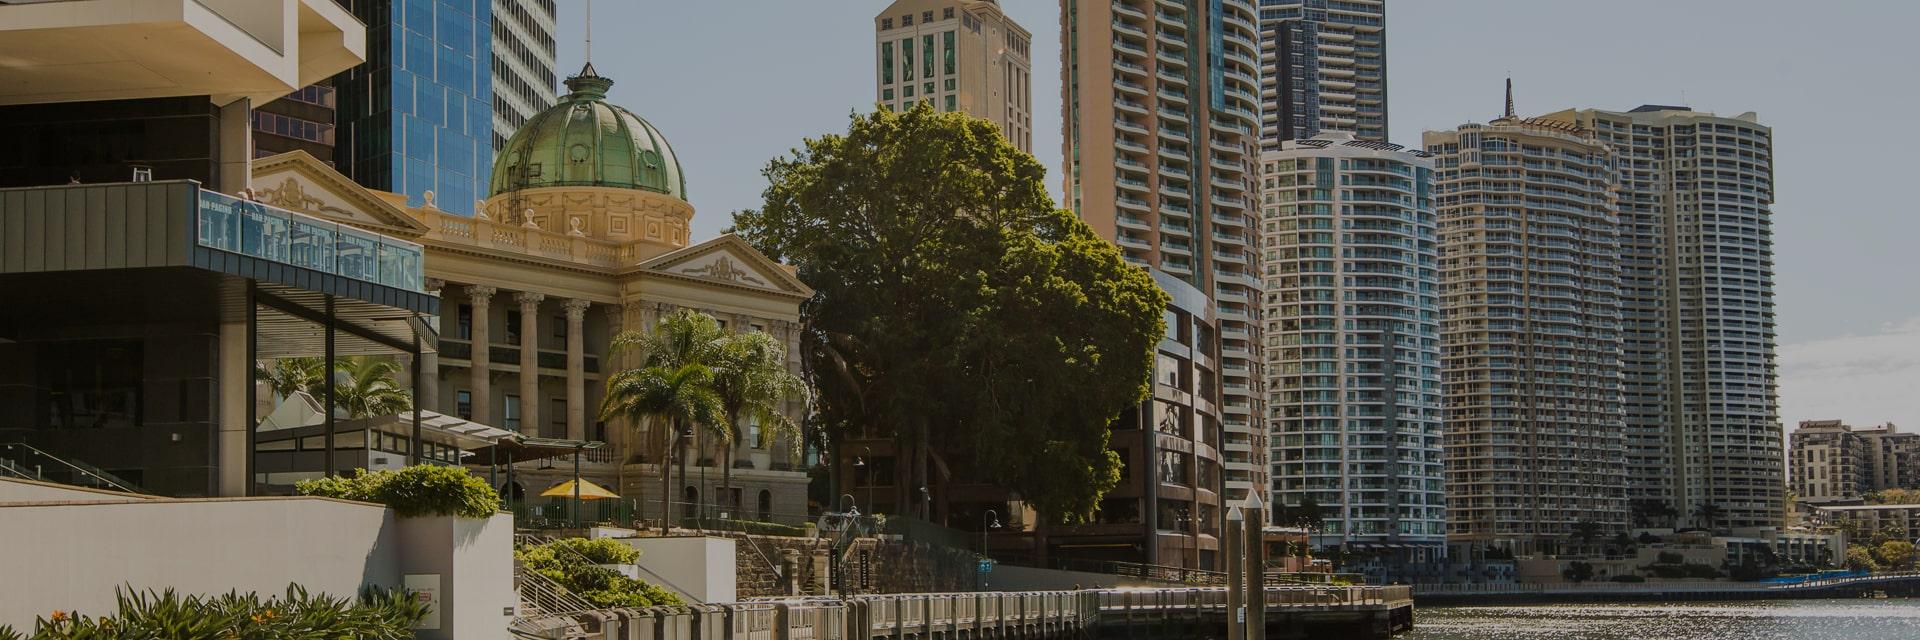 Charles Sturt University, Brisbane